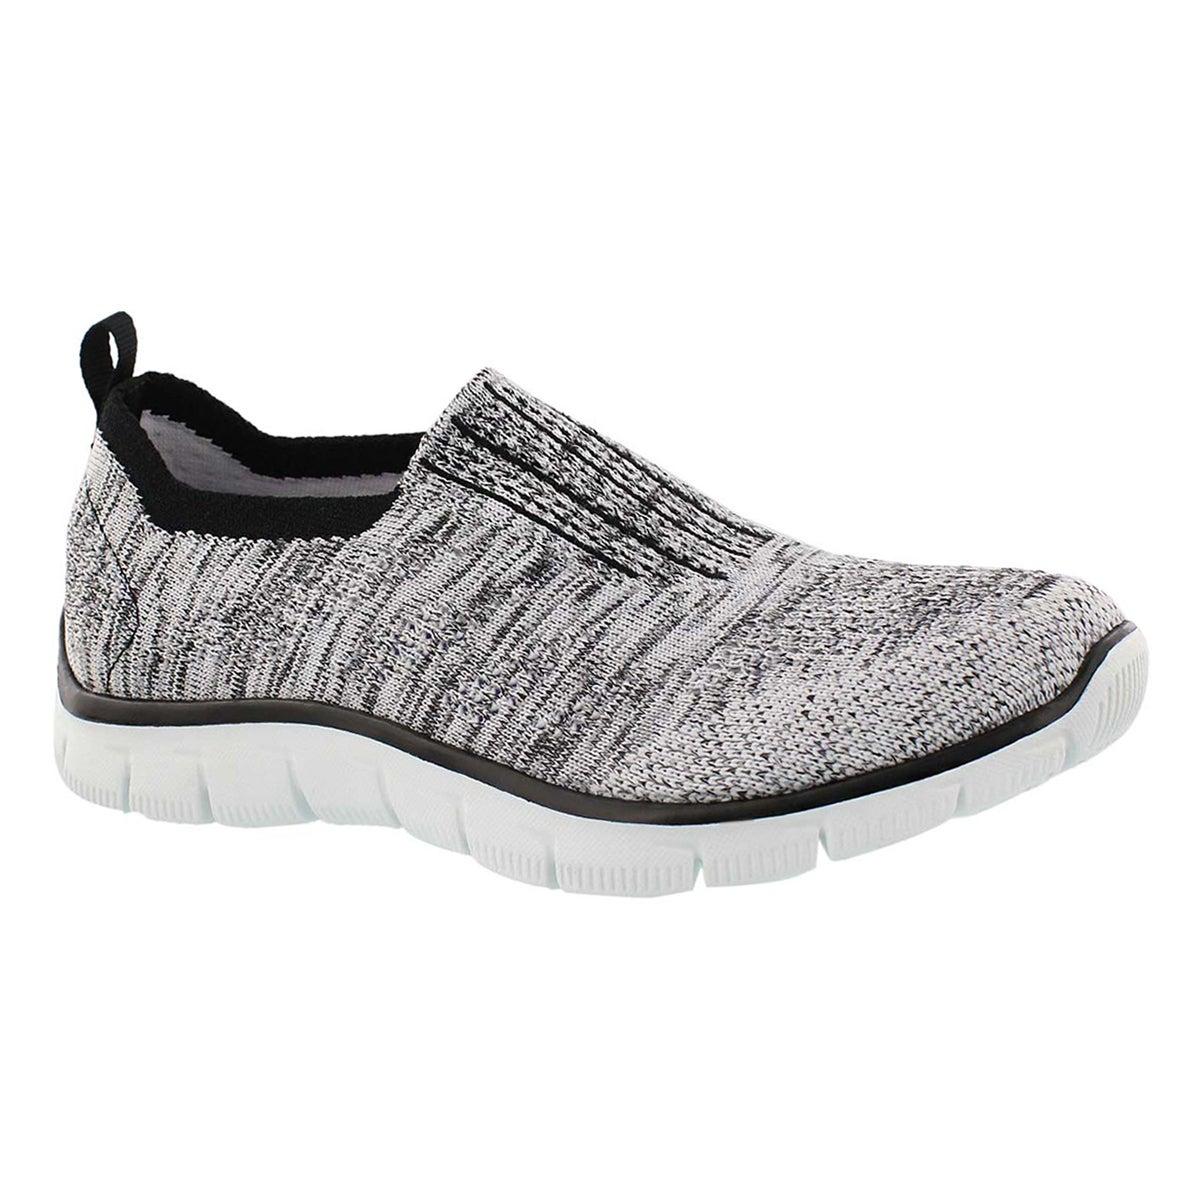 Women's EMPIRE INSIDE LOOK black/wht slip on shoes